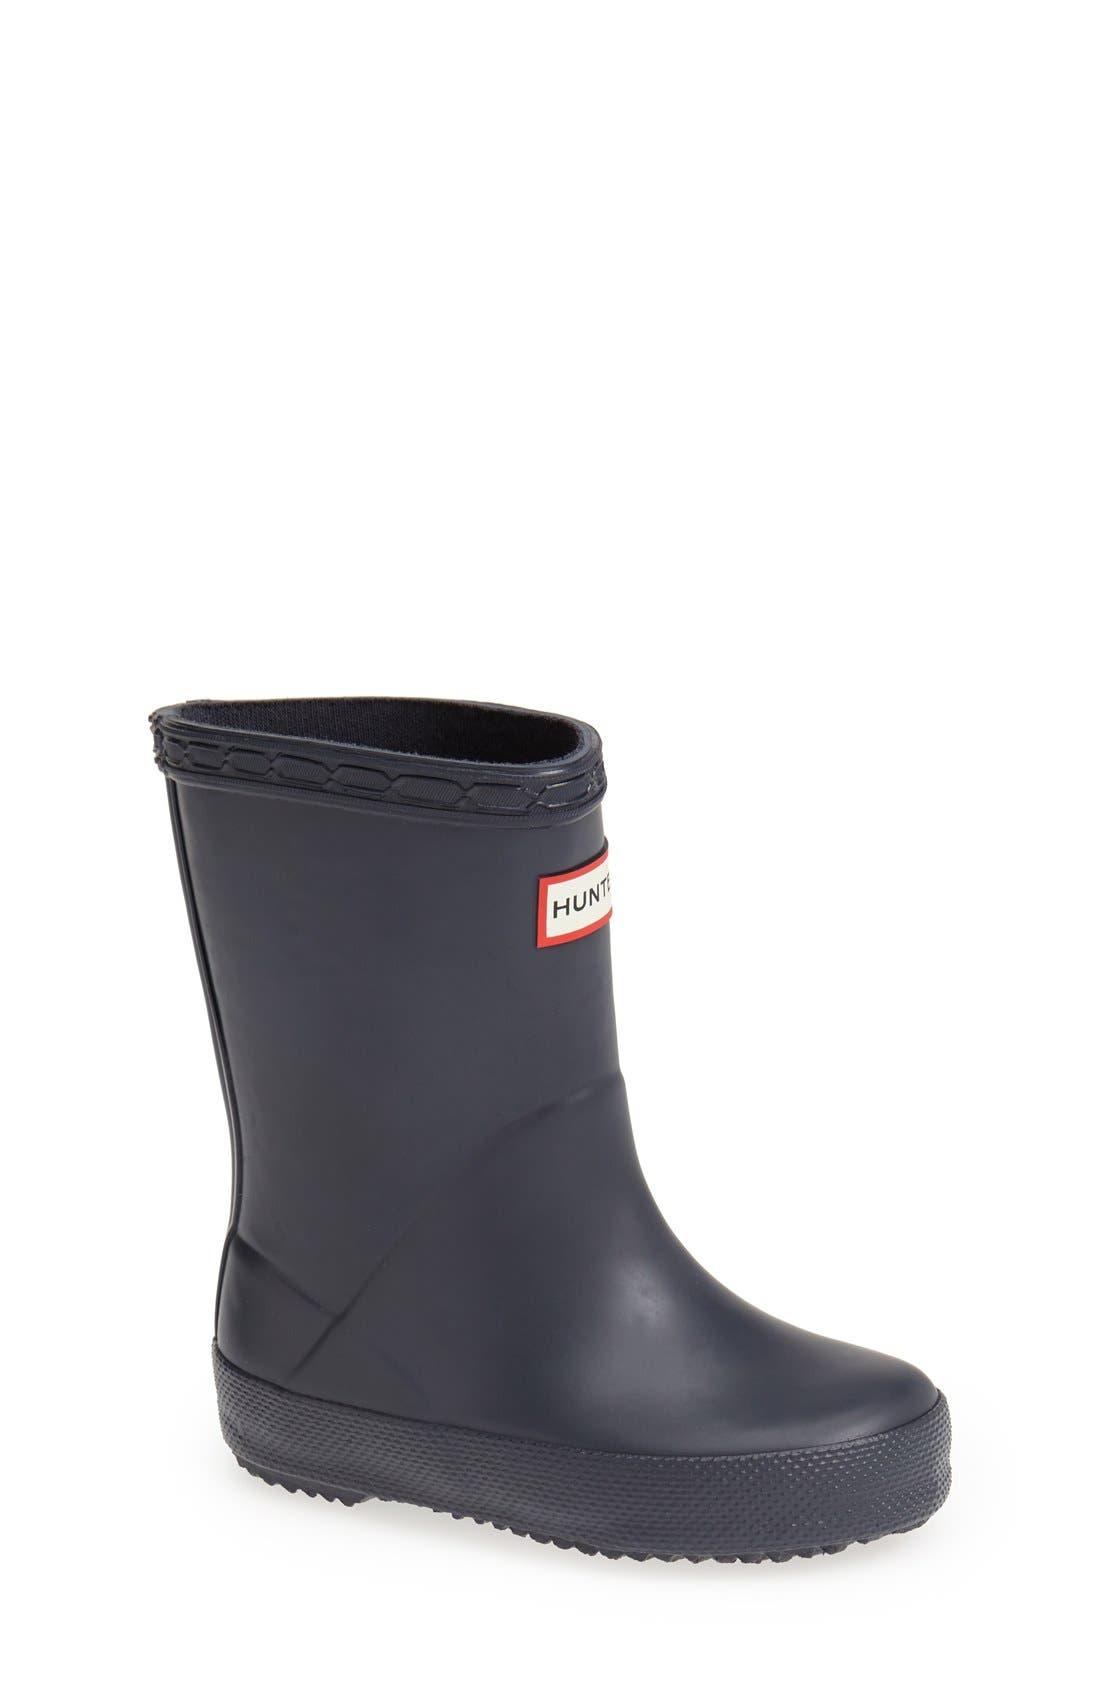 Main Image - Hunter 'First Classic' Rain Boot (Walker, Toddler & Little Kid)